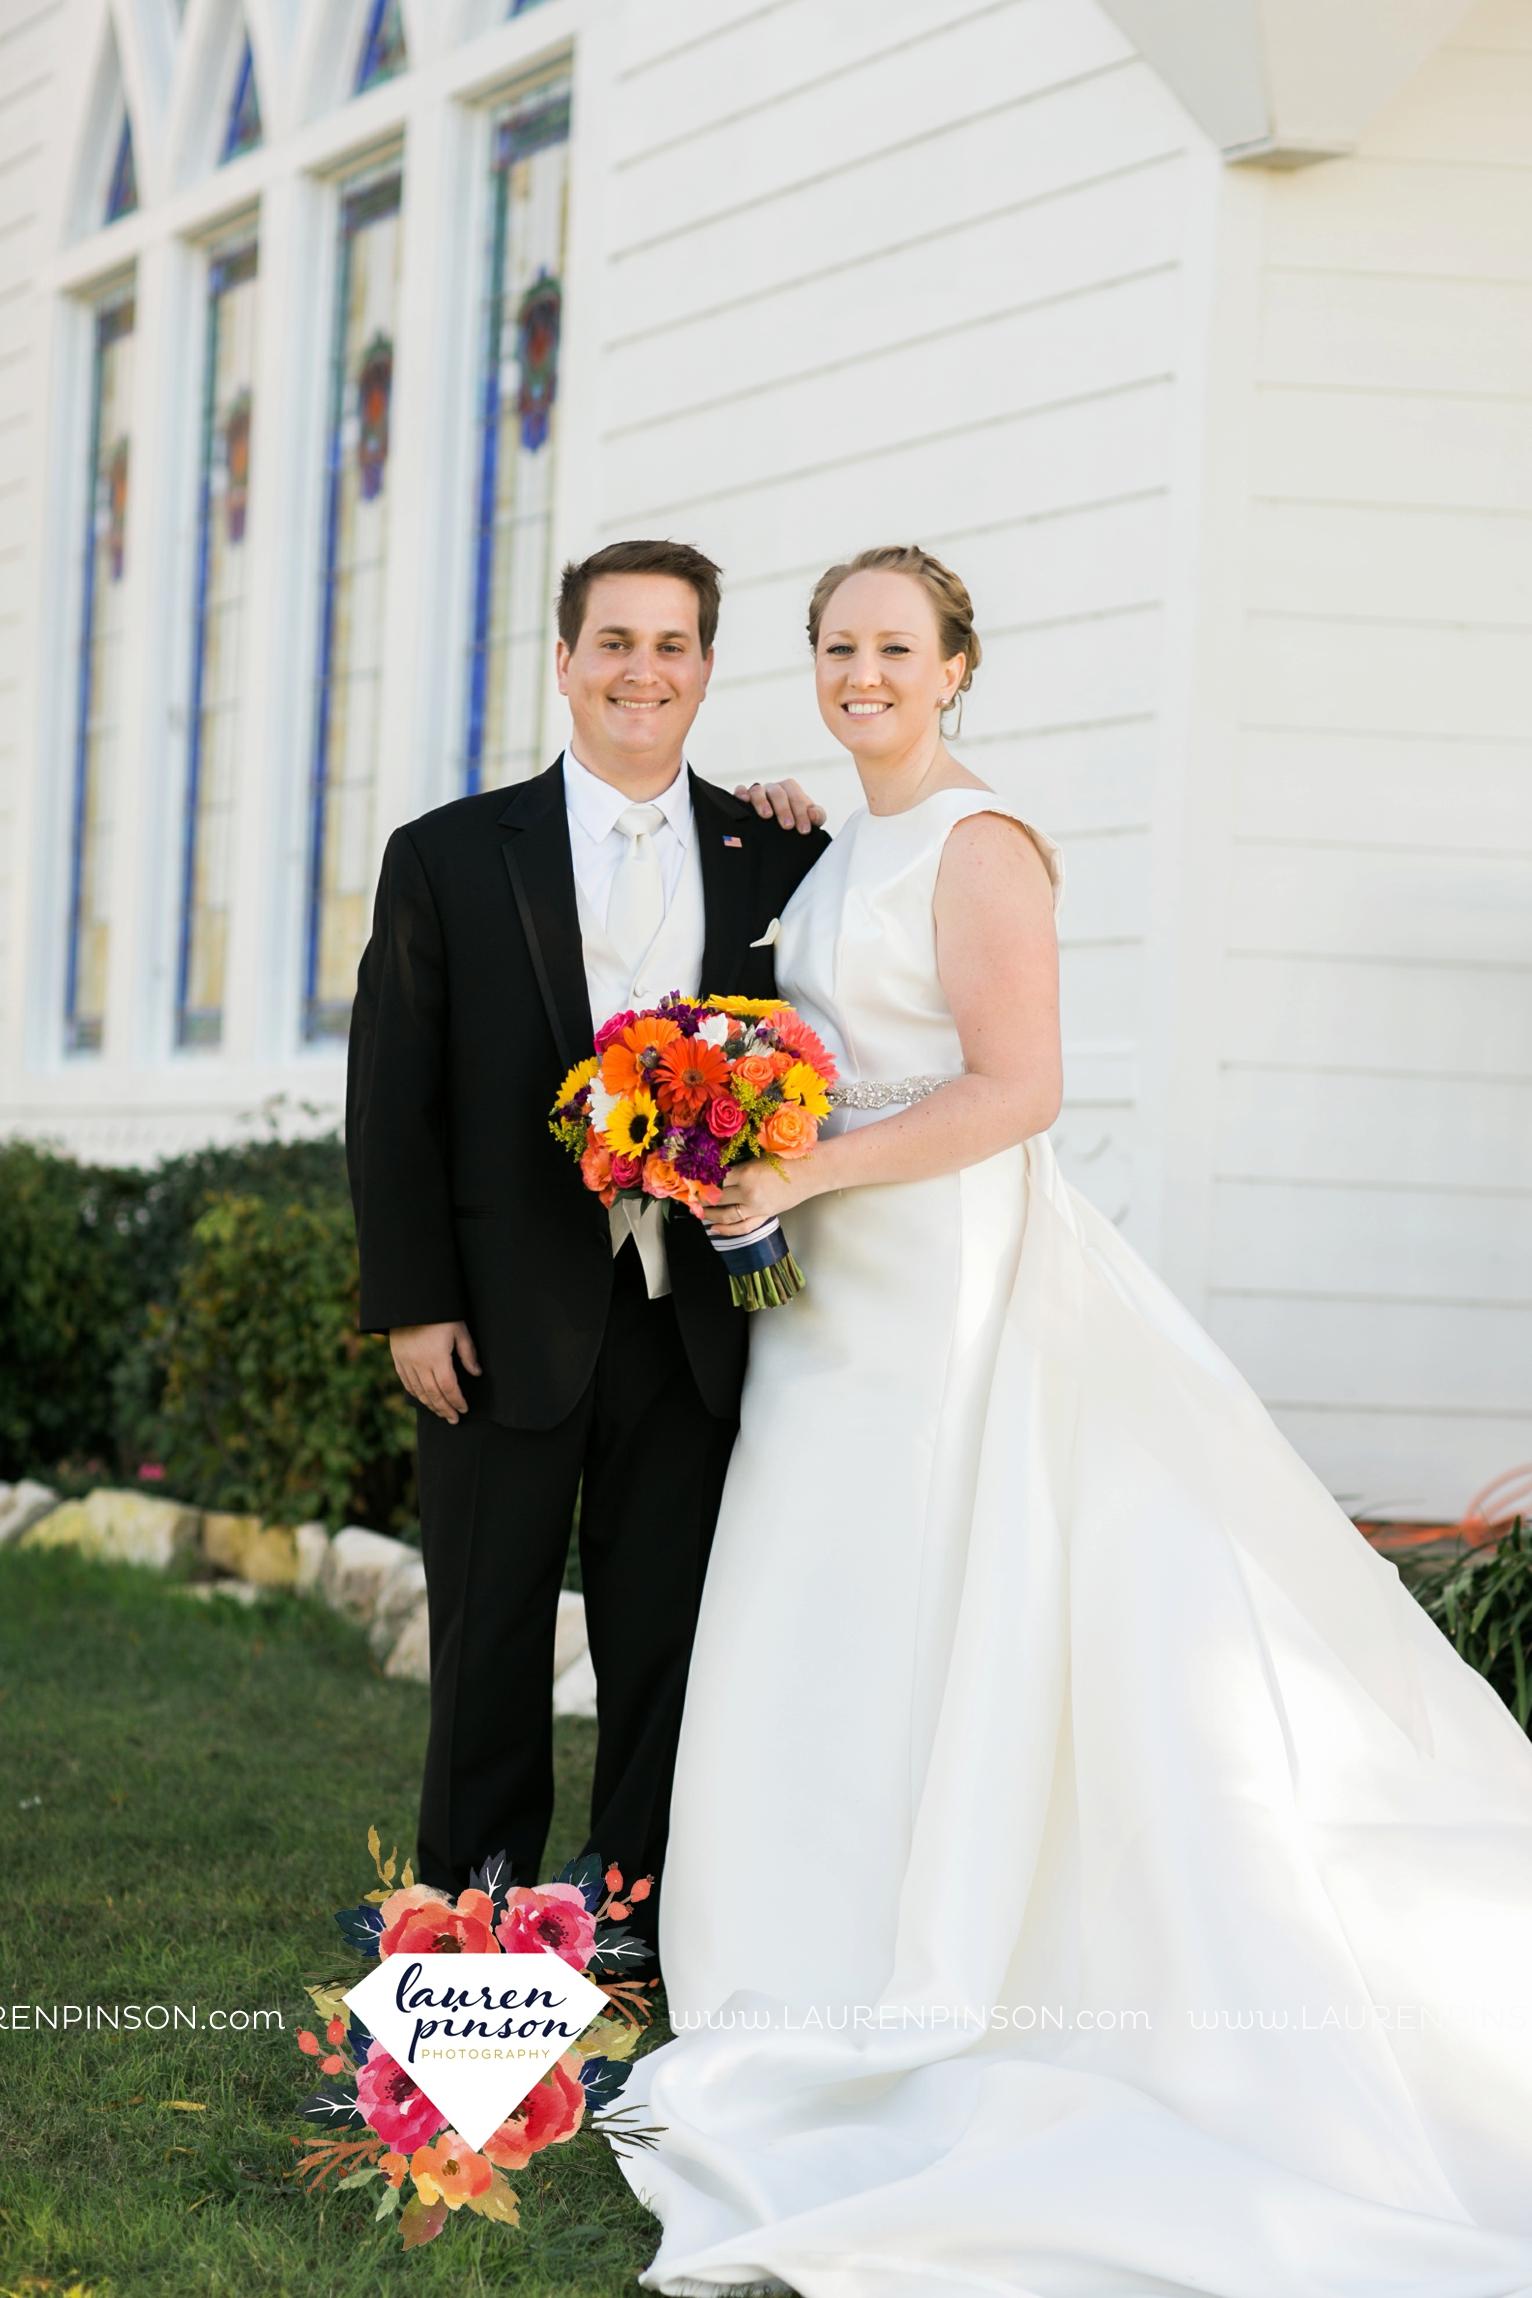 bells-texas-wedding-photography-at-willowood-ranch-chapel-north-texas-wichita-falls-wedding-photographer_1842.jpg